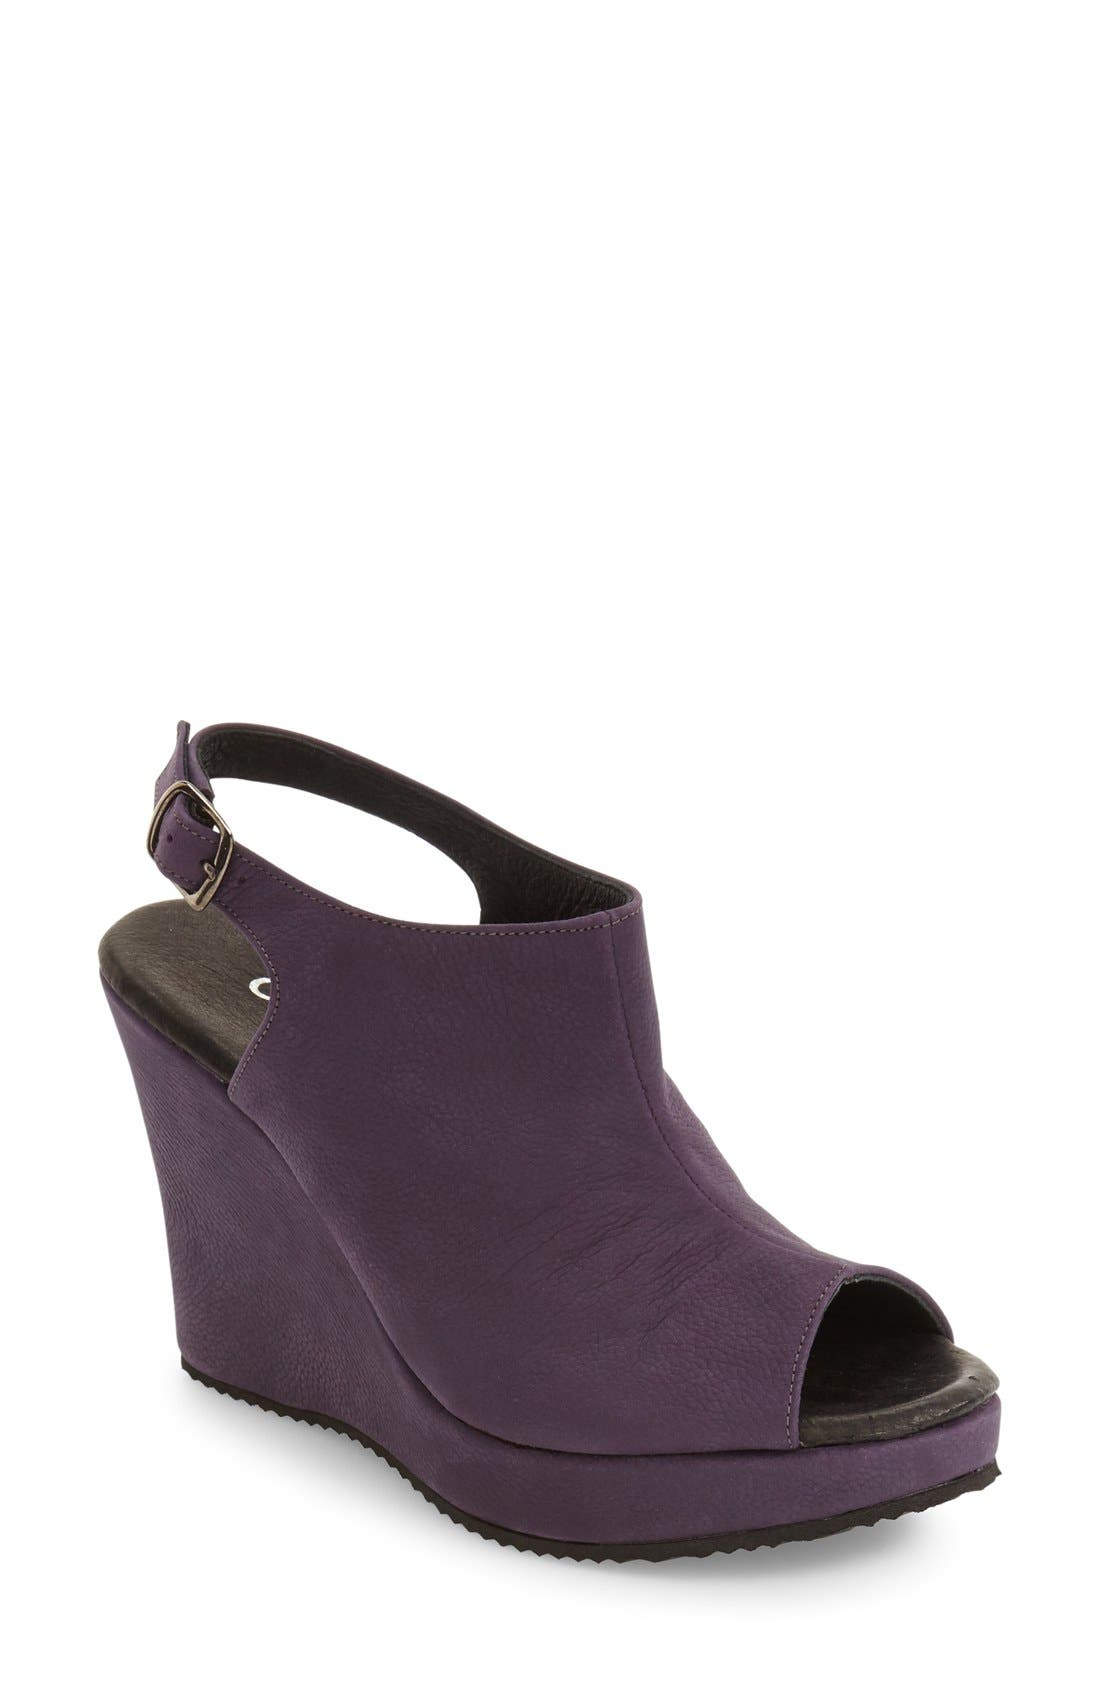 Alternate Image 1 Selected - Cordani 'Wellesley' Sandal